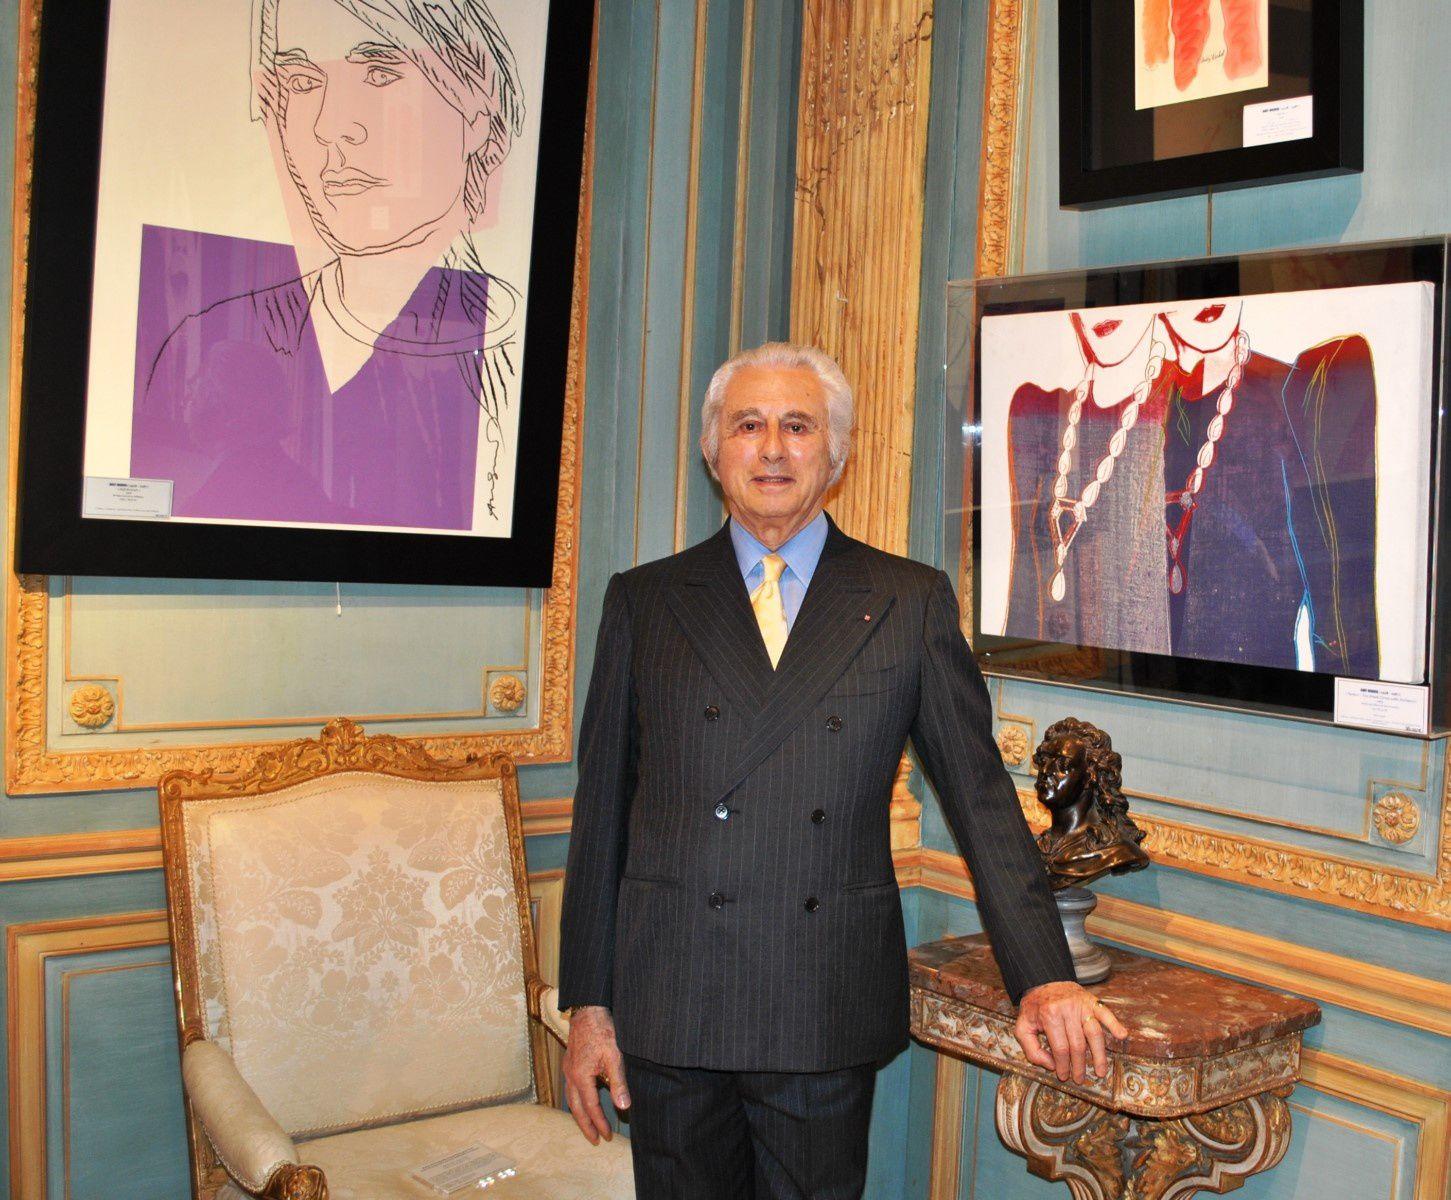 ADRIANO RIBOLZI - (c) Luigi MATTERA